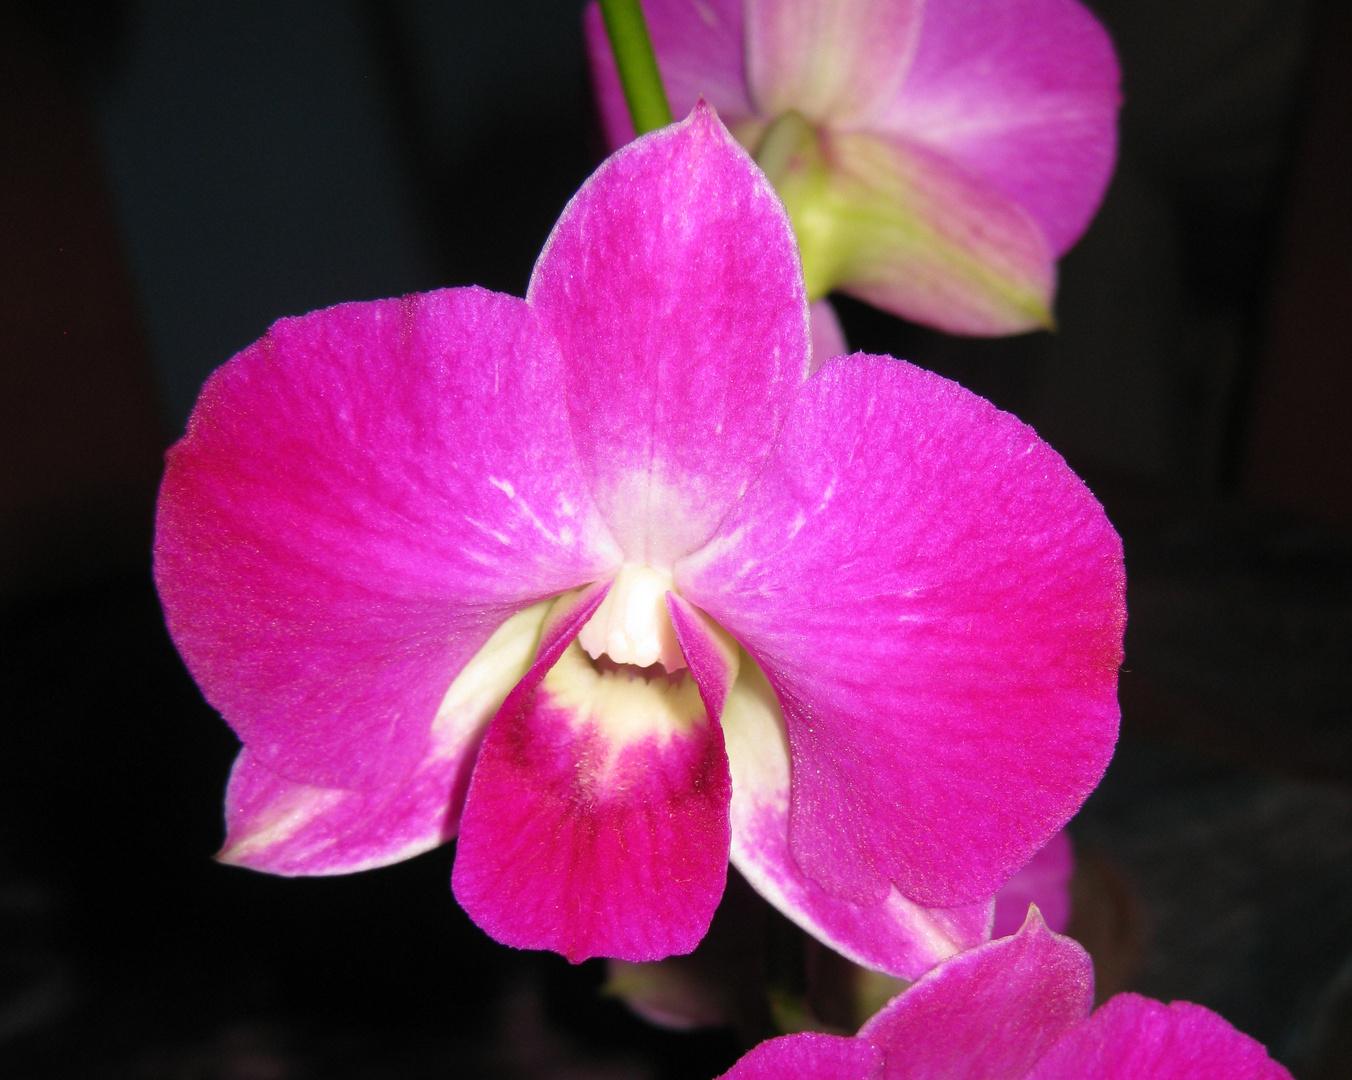 Orchidee, 19.11.2011